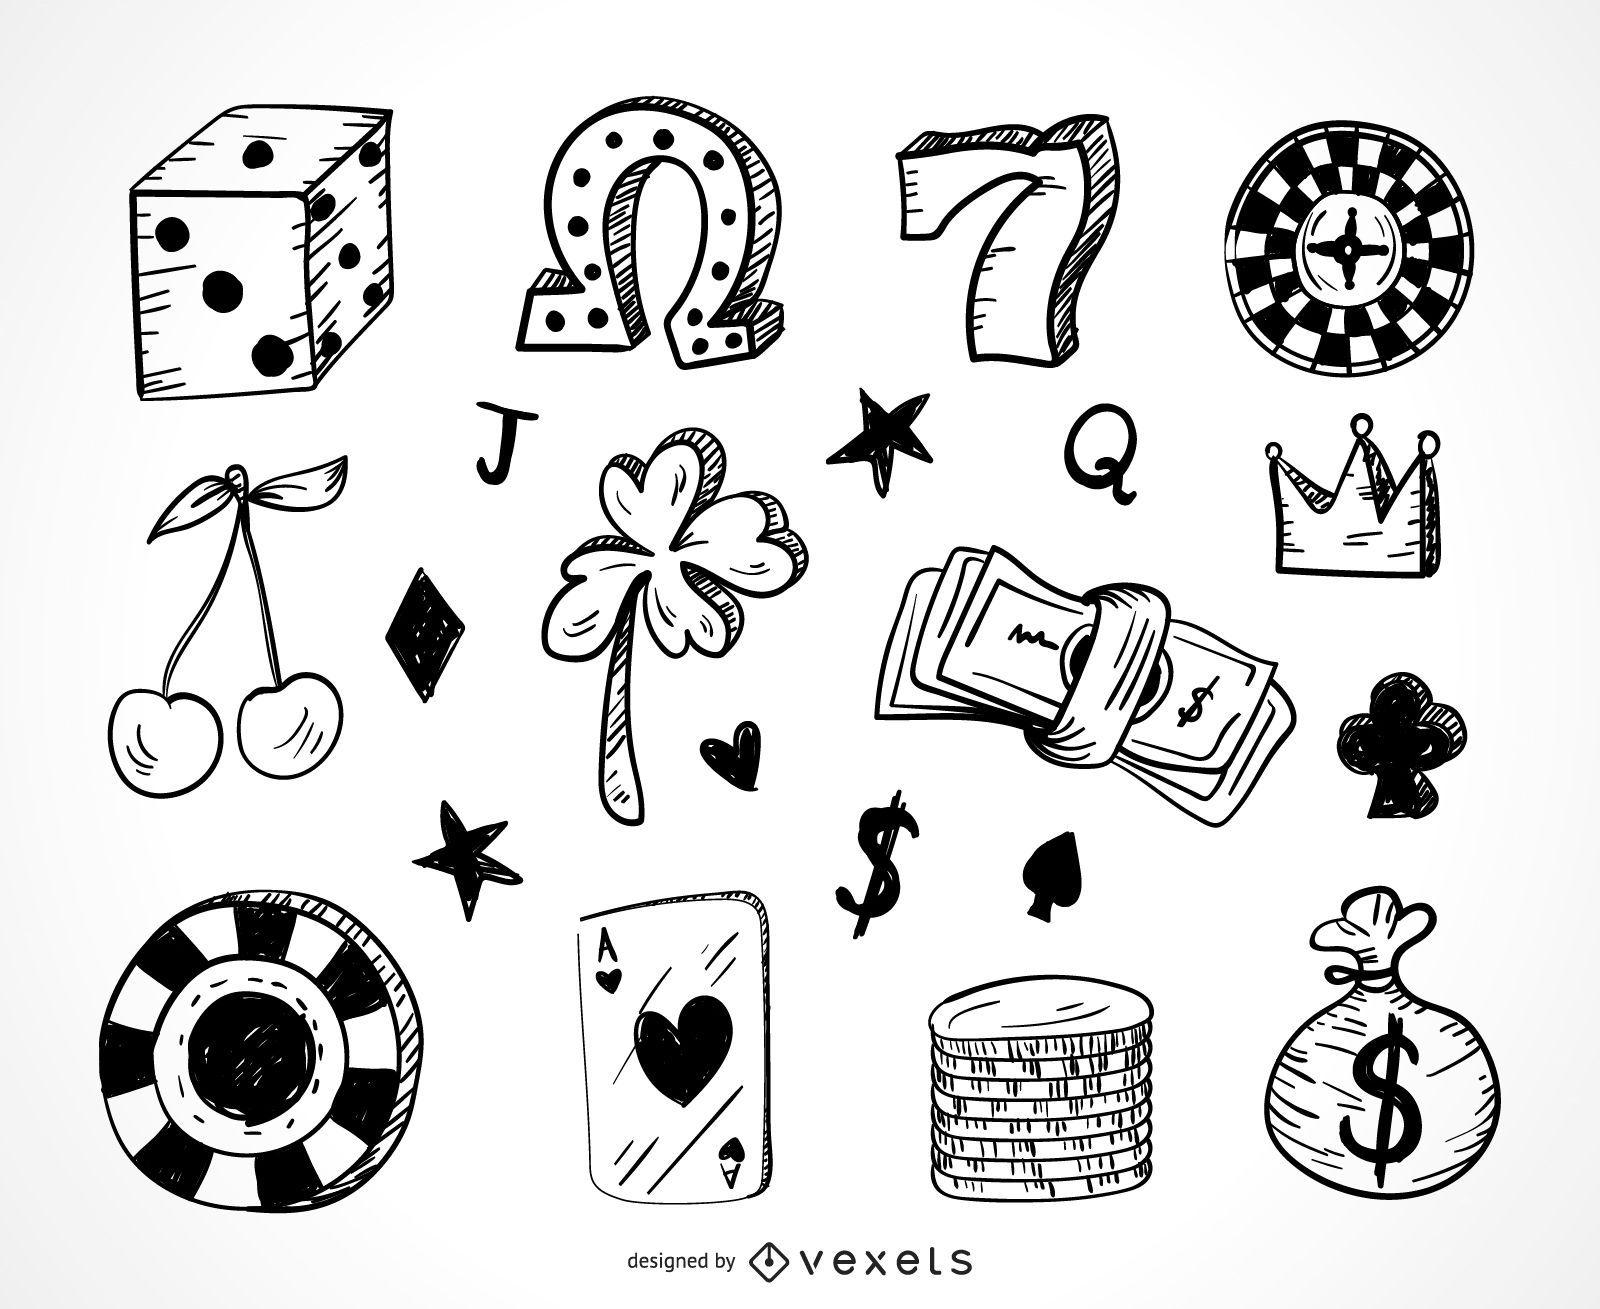 Casino gambling icons doodle set